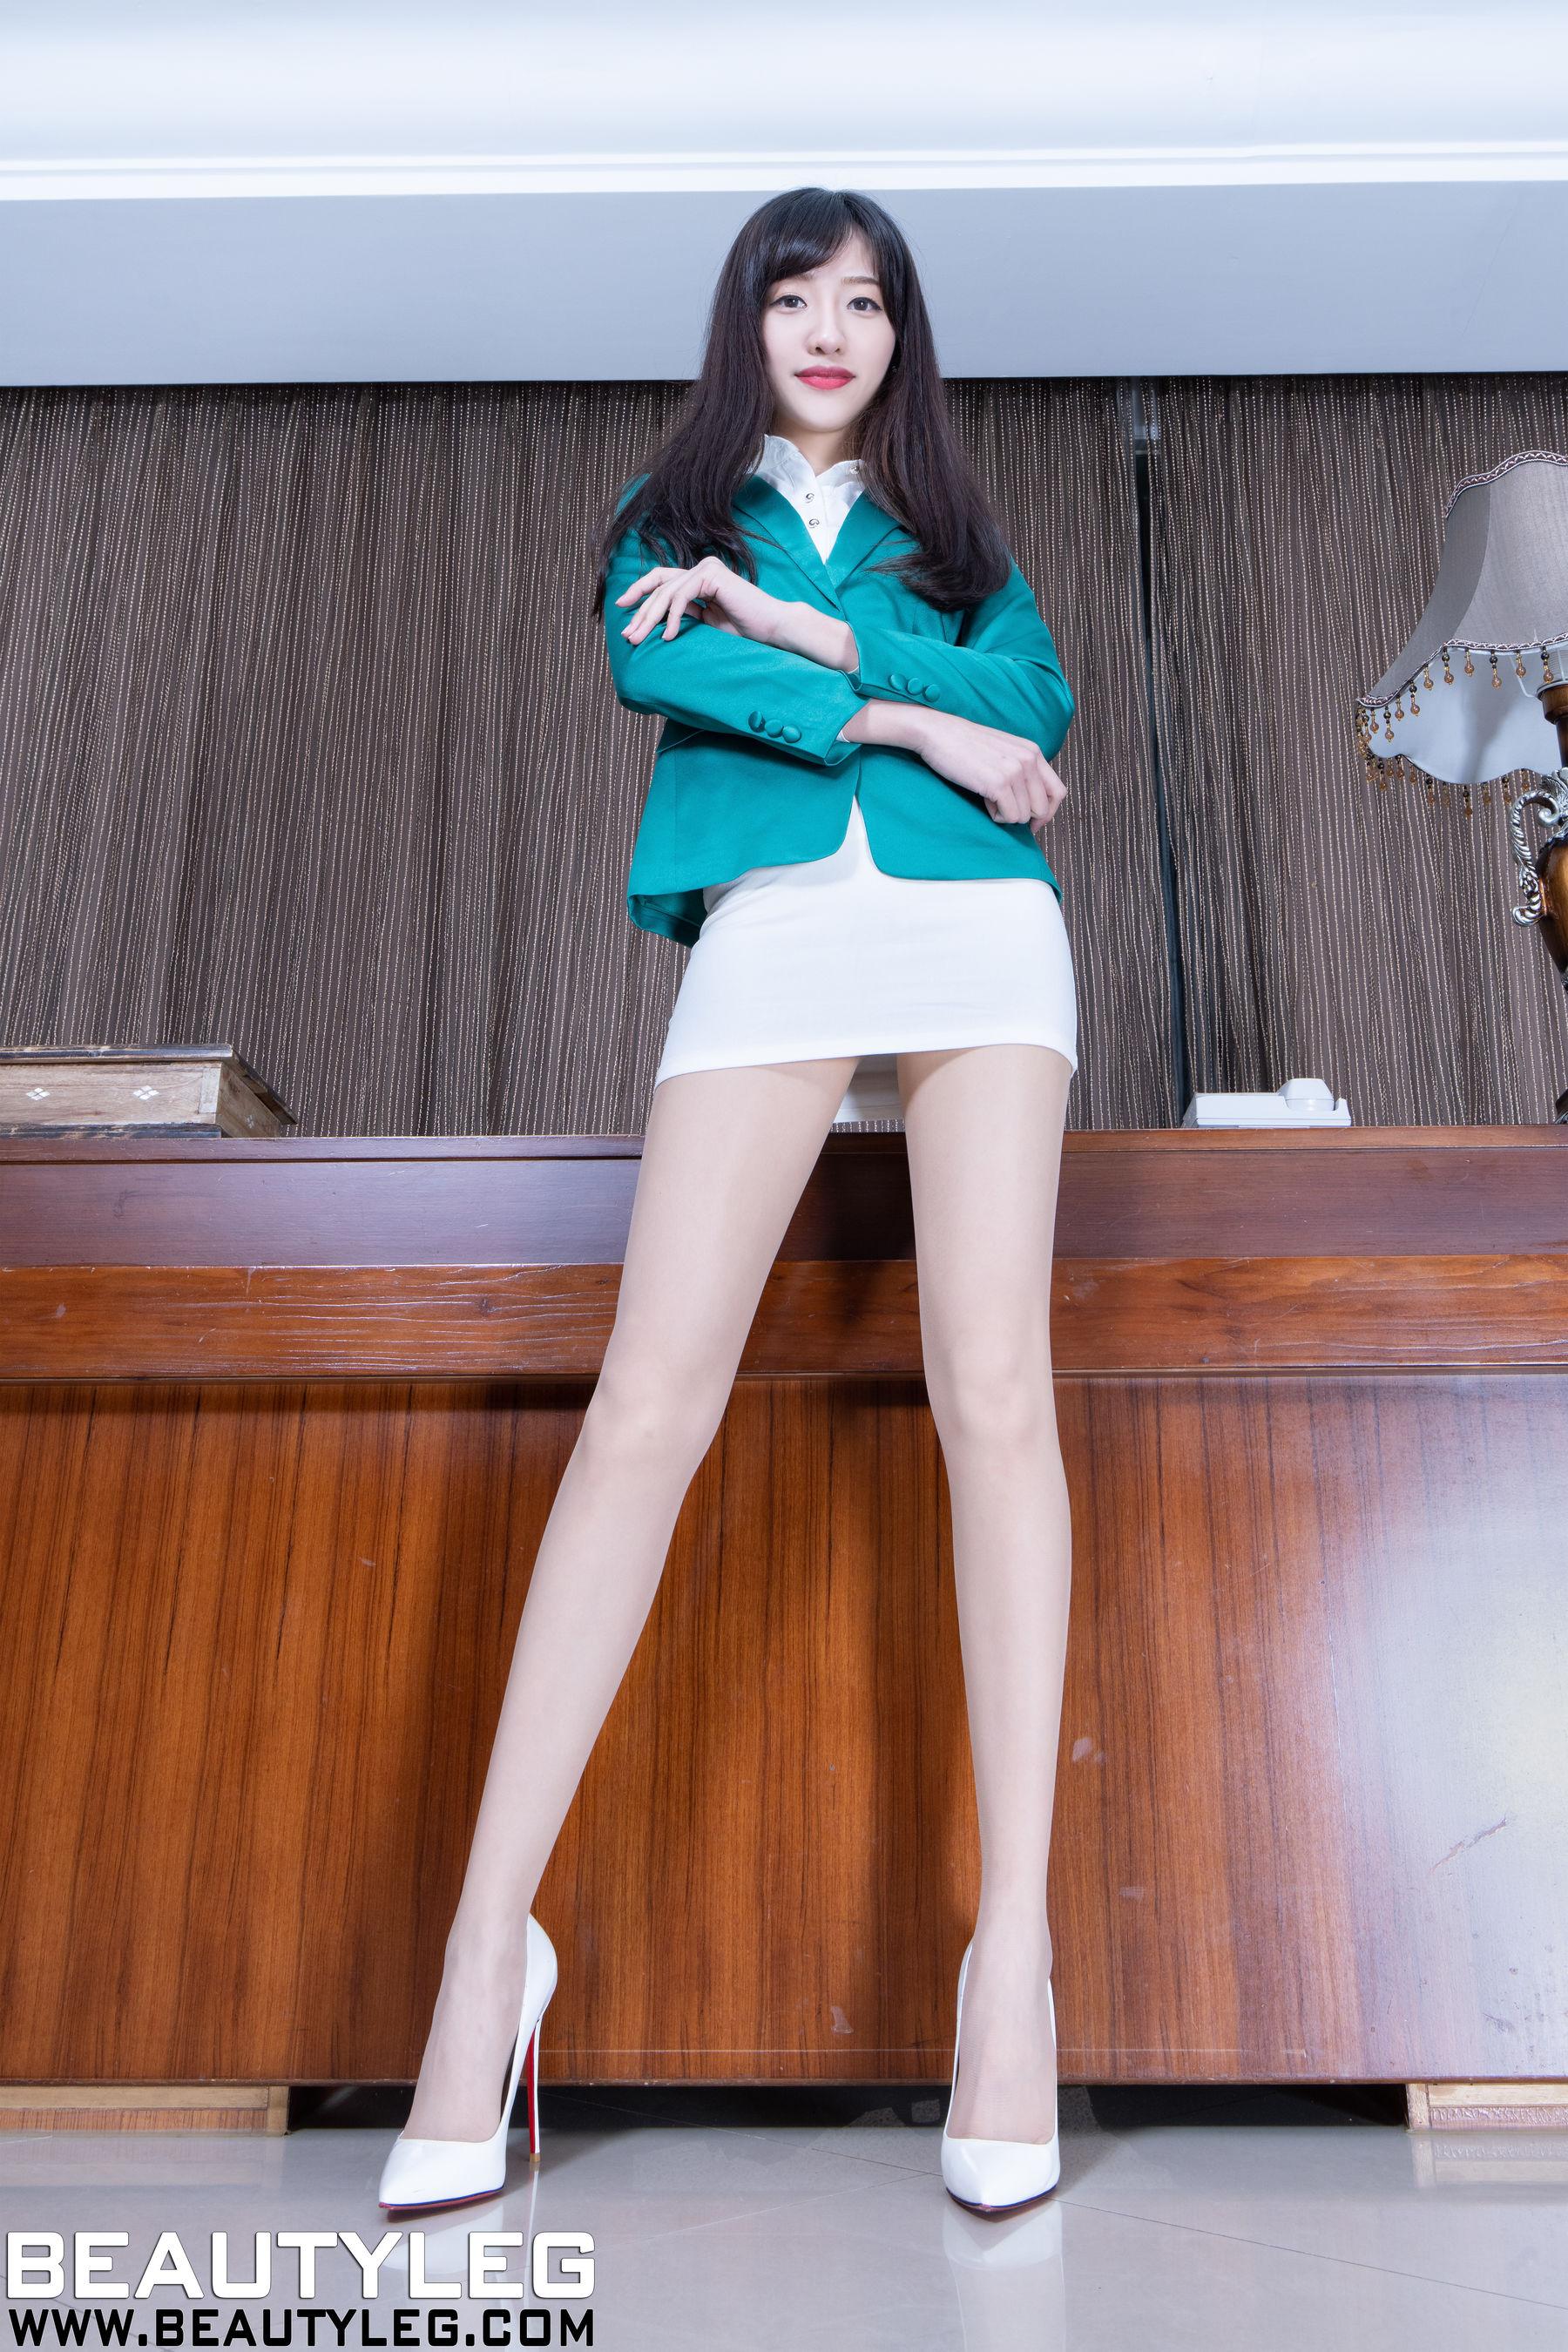 VOL.620 [Beautyleg]肉丝美腿:欣洁(腿模Celia)超高清个人性感漂亮大图(36P)